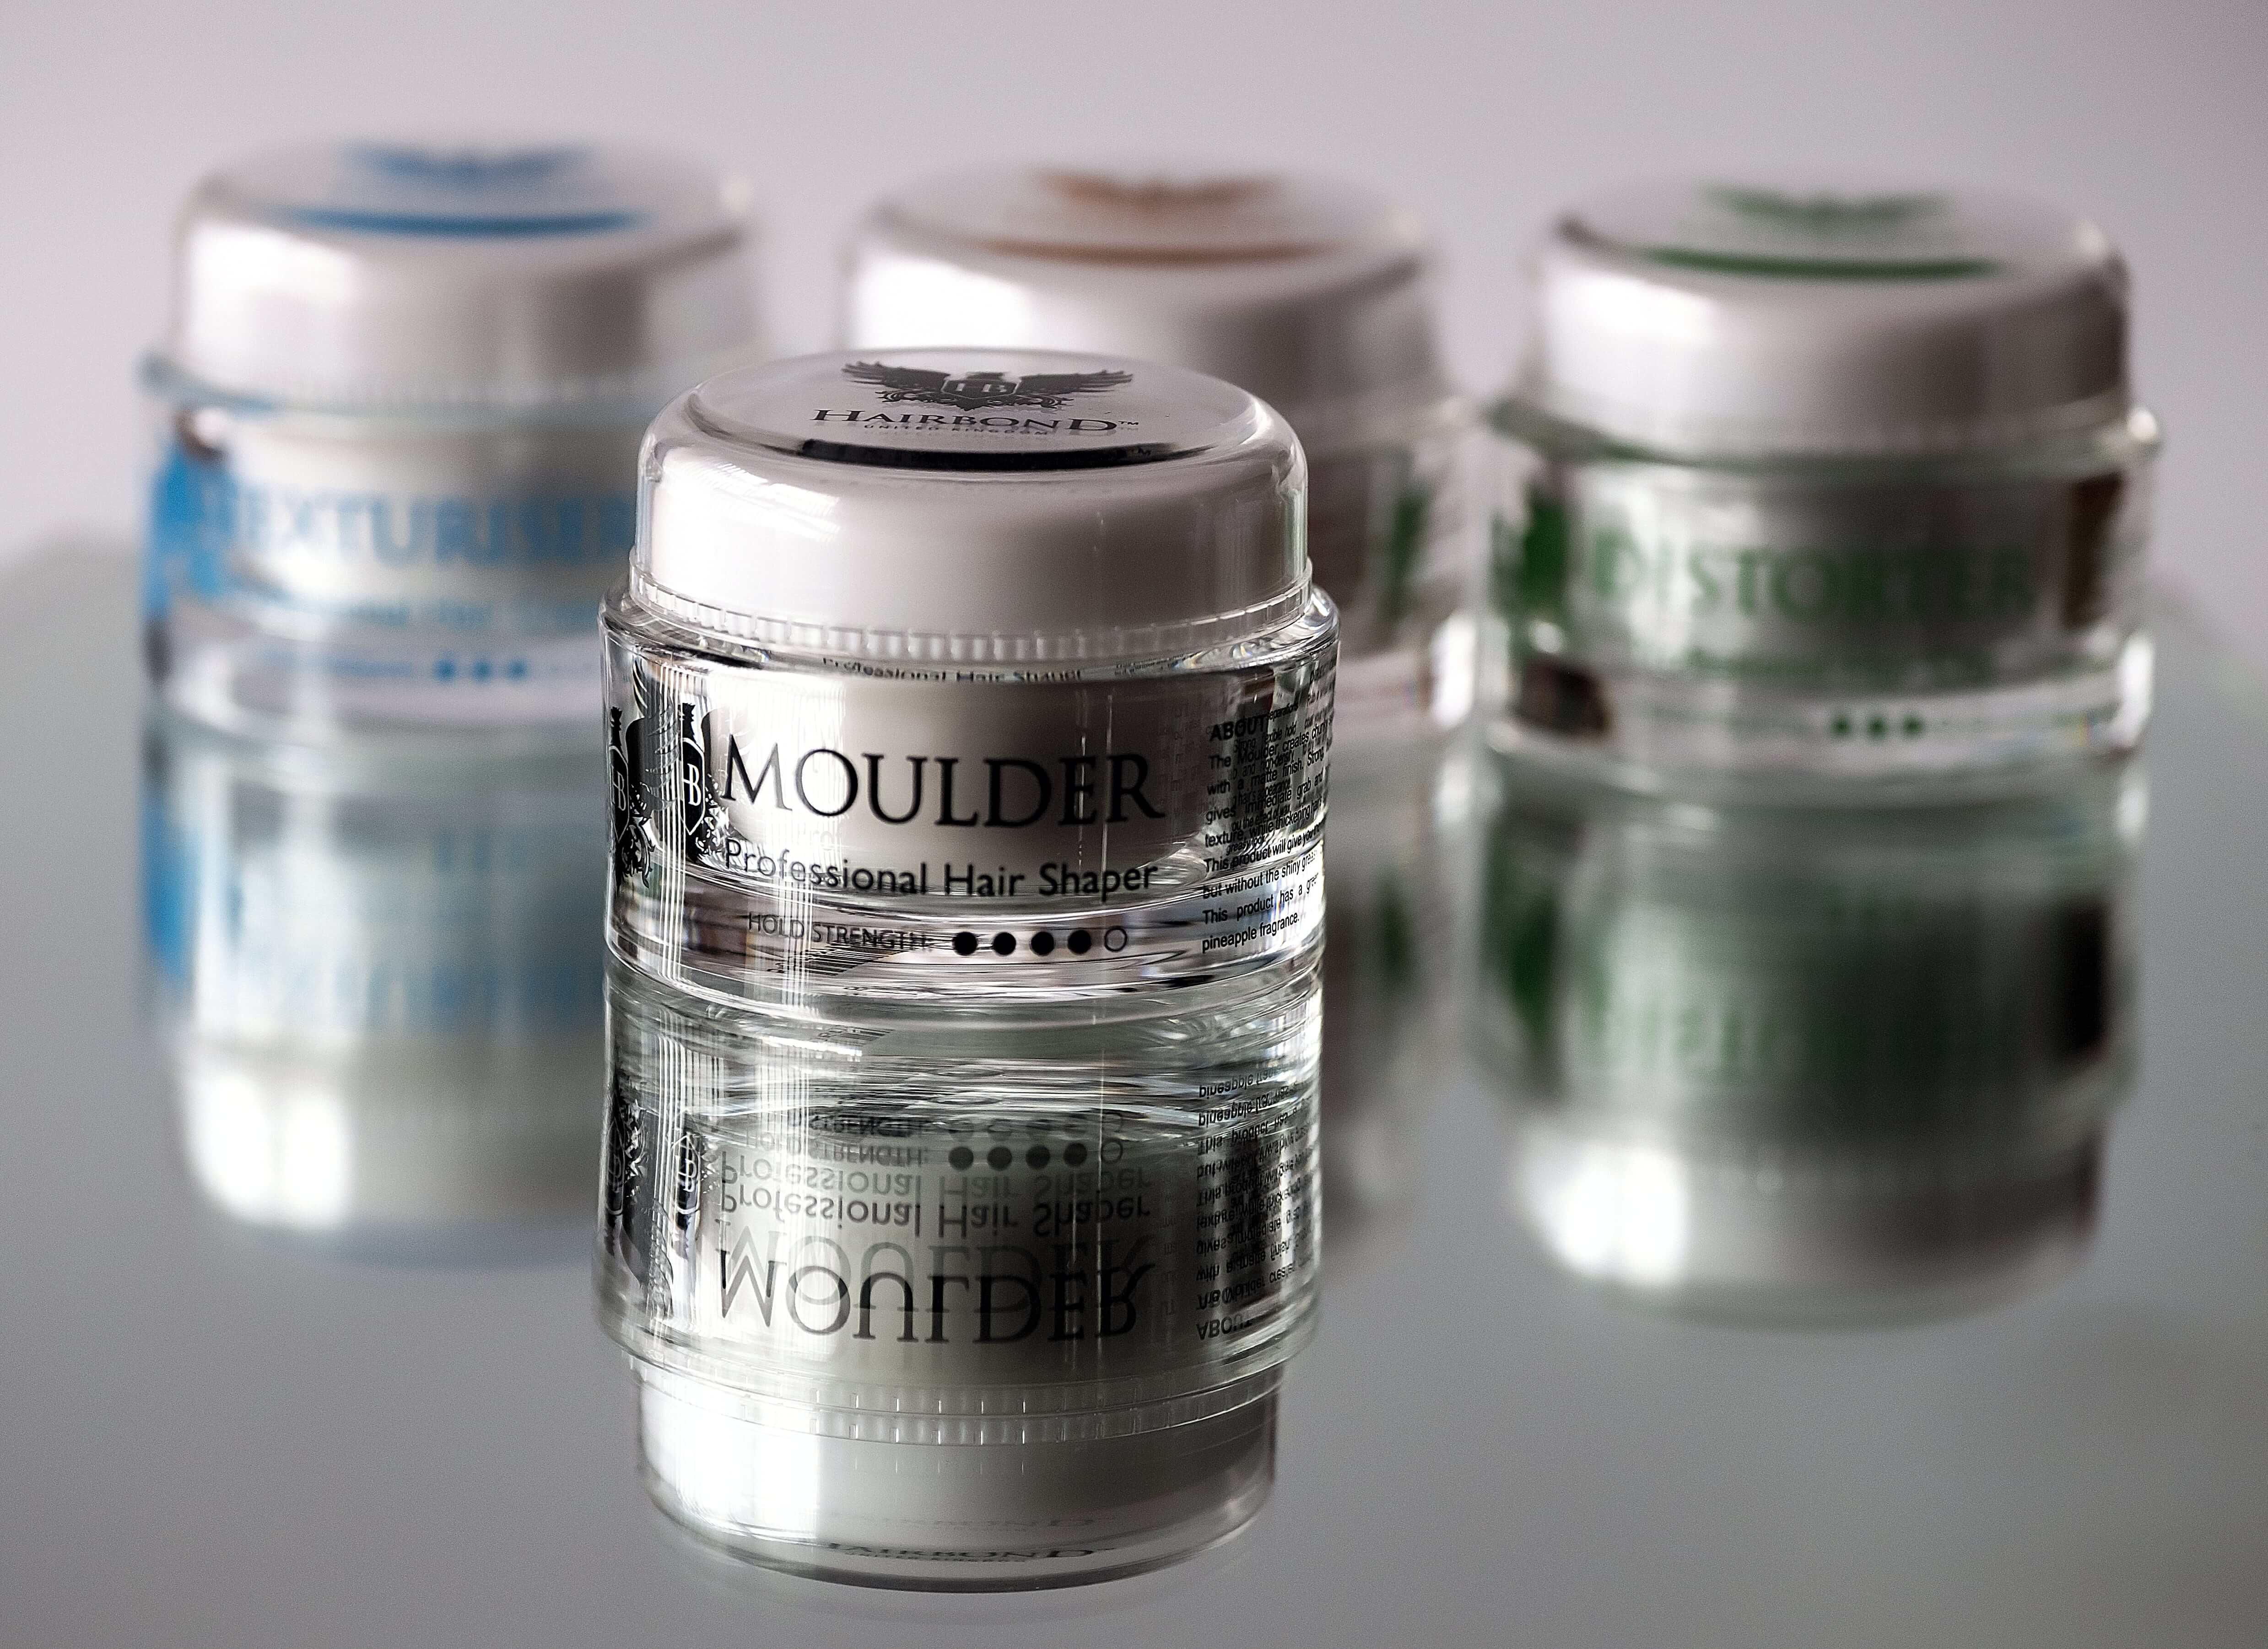 Hairbond - Moulder Distorter Shaper Texturiser